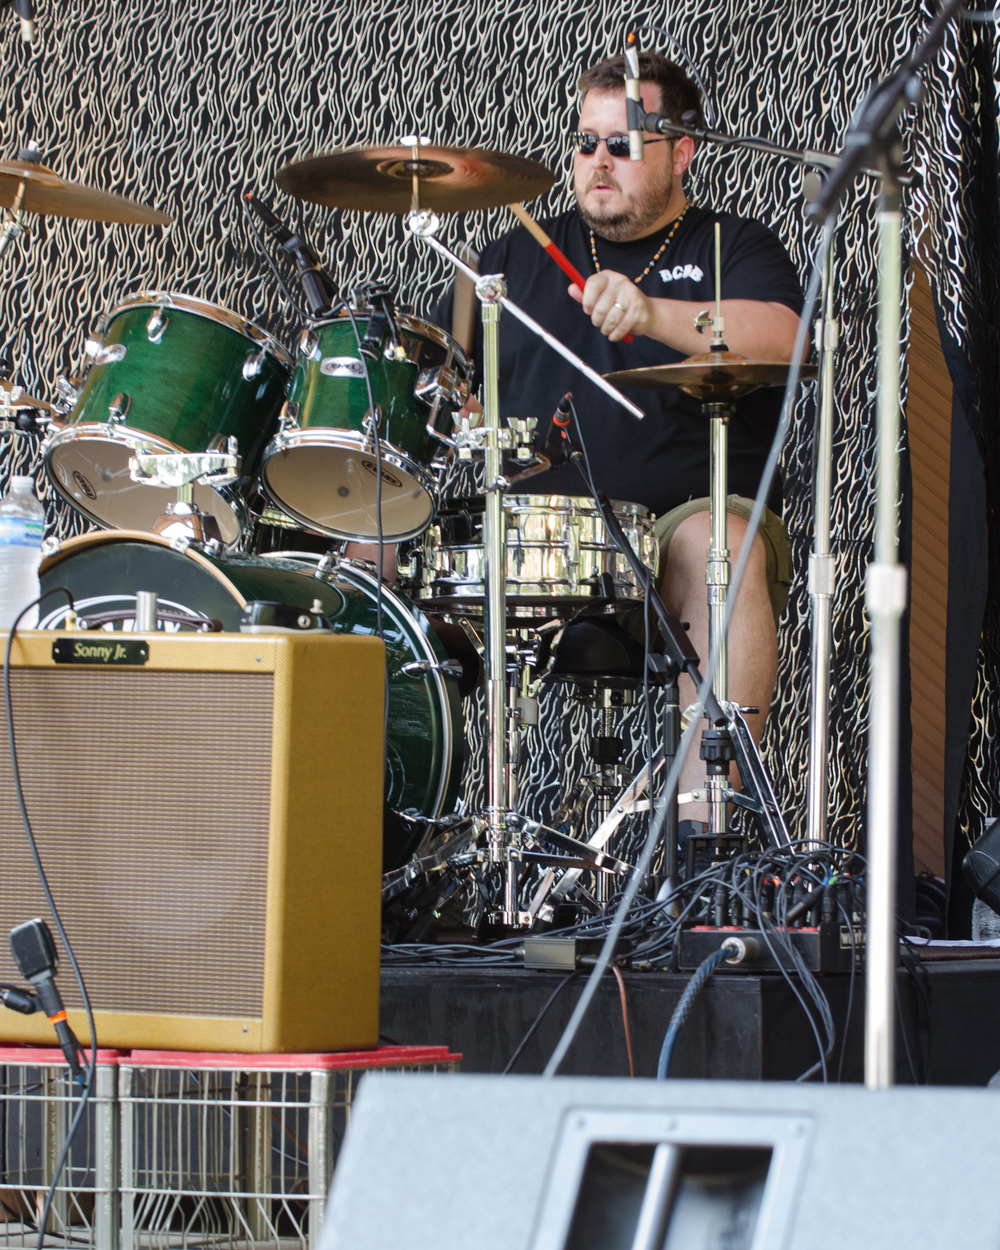 Fleetwood_Blues_Festival_2013-08-11_-161.jpg